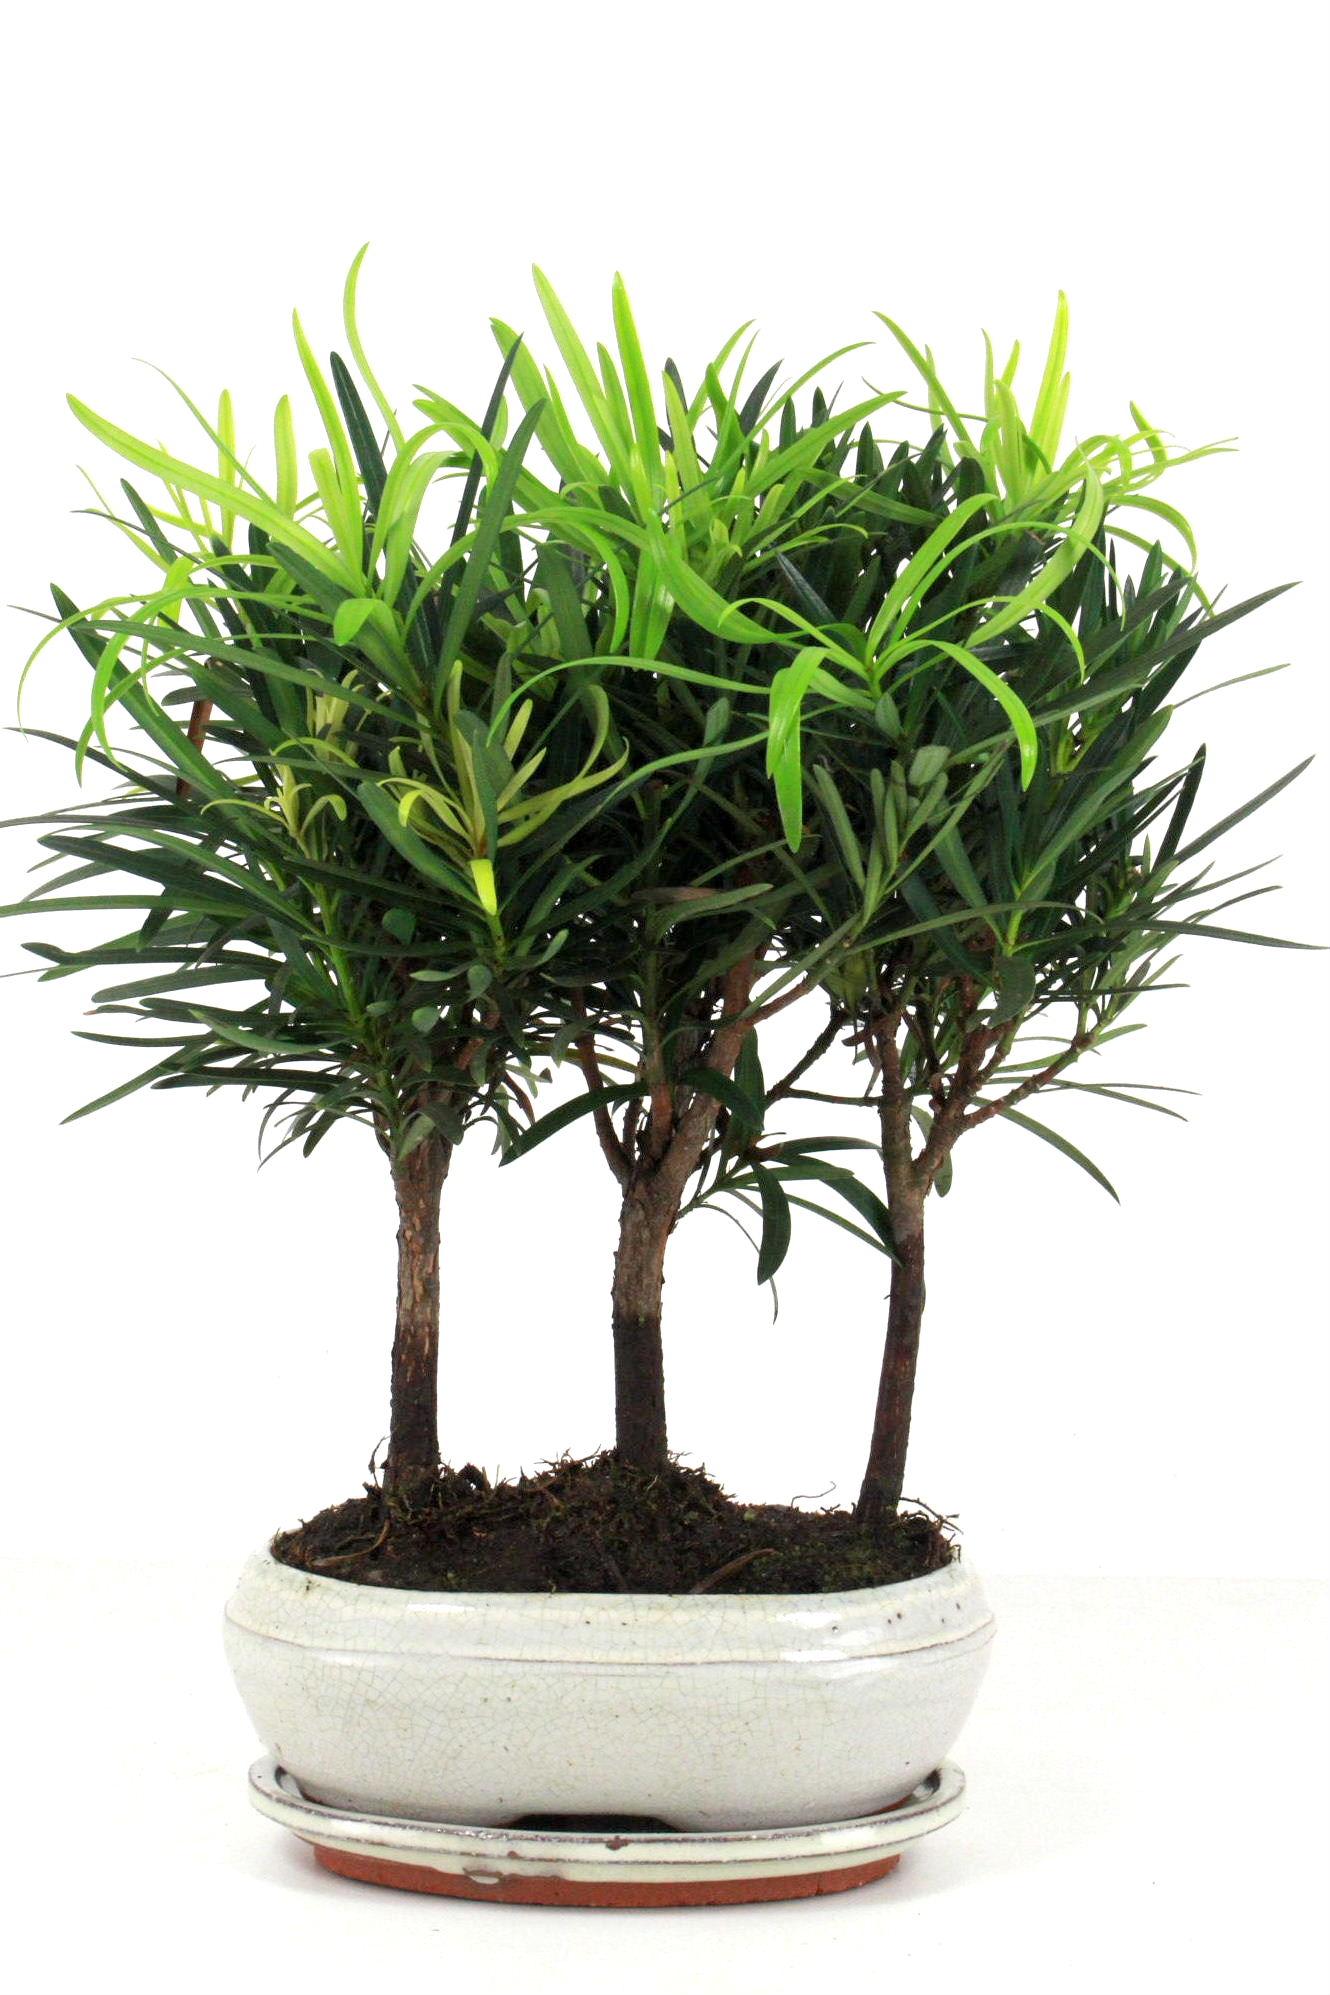 steineibe bonsai gruppenpflanzung 35 40 cm 2121 bei oyaki. Black Bedroom Furniture Sets. Home Design Ideas